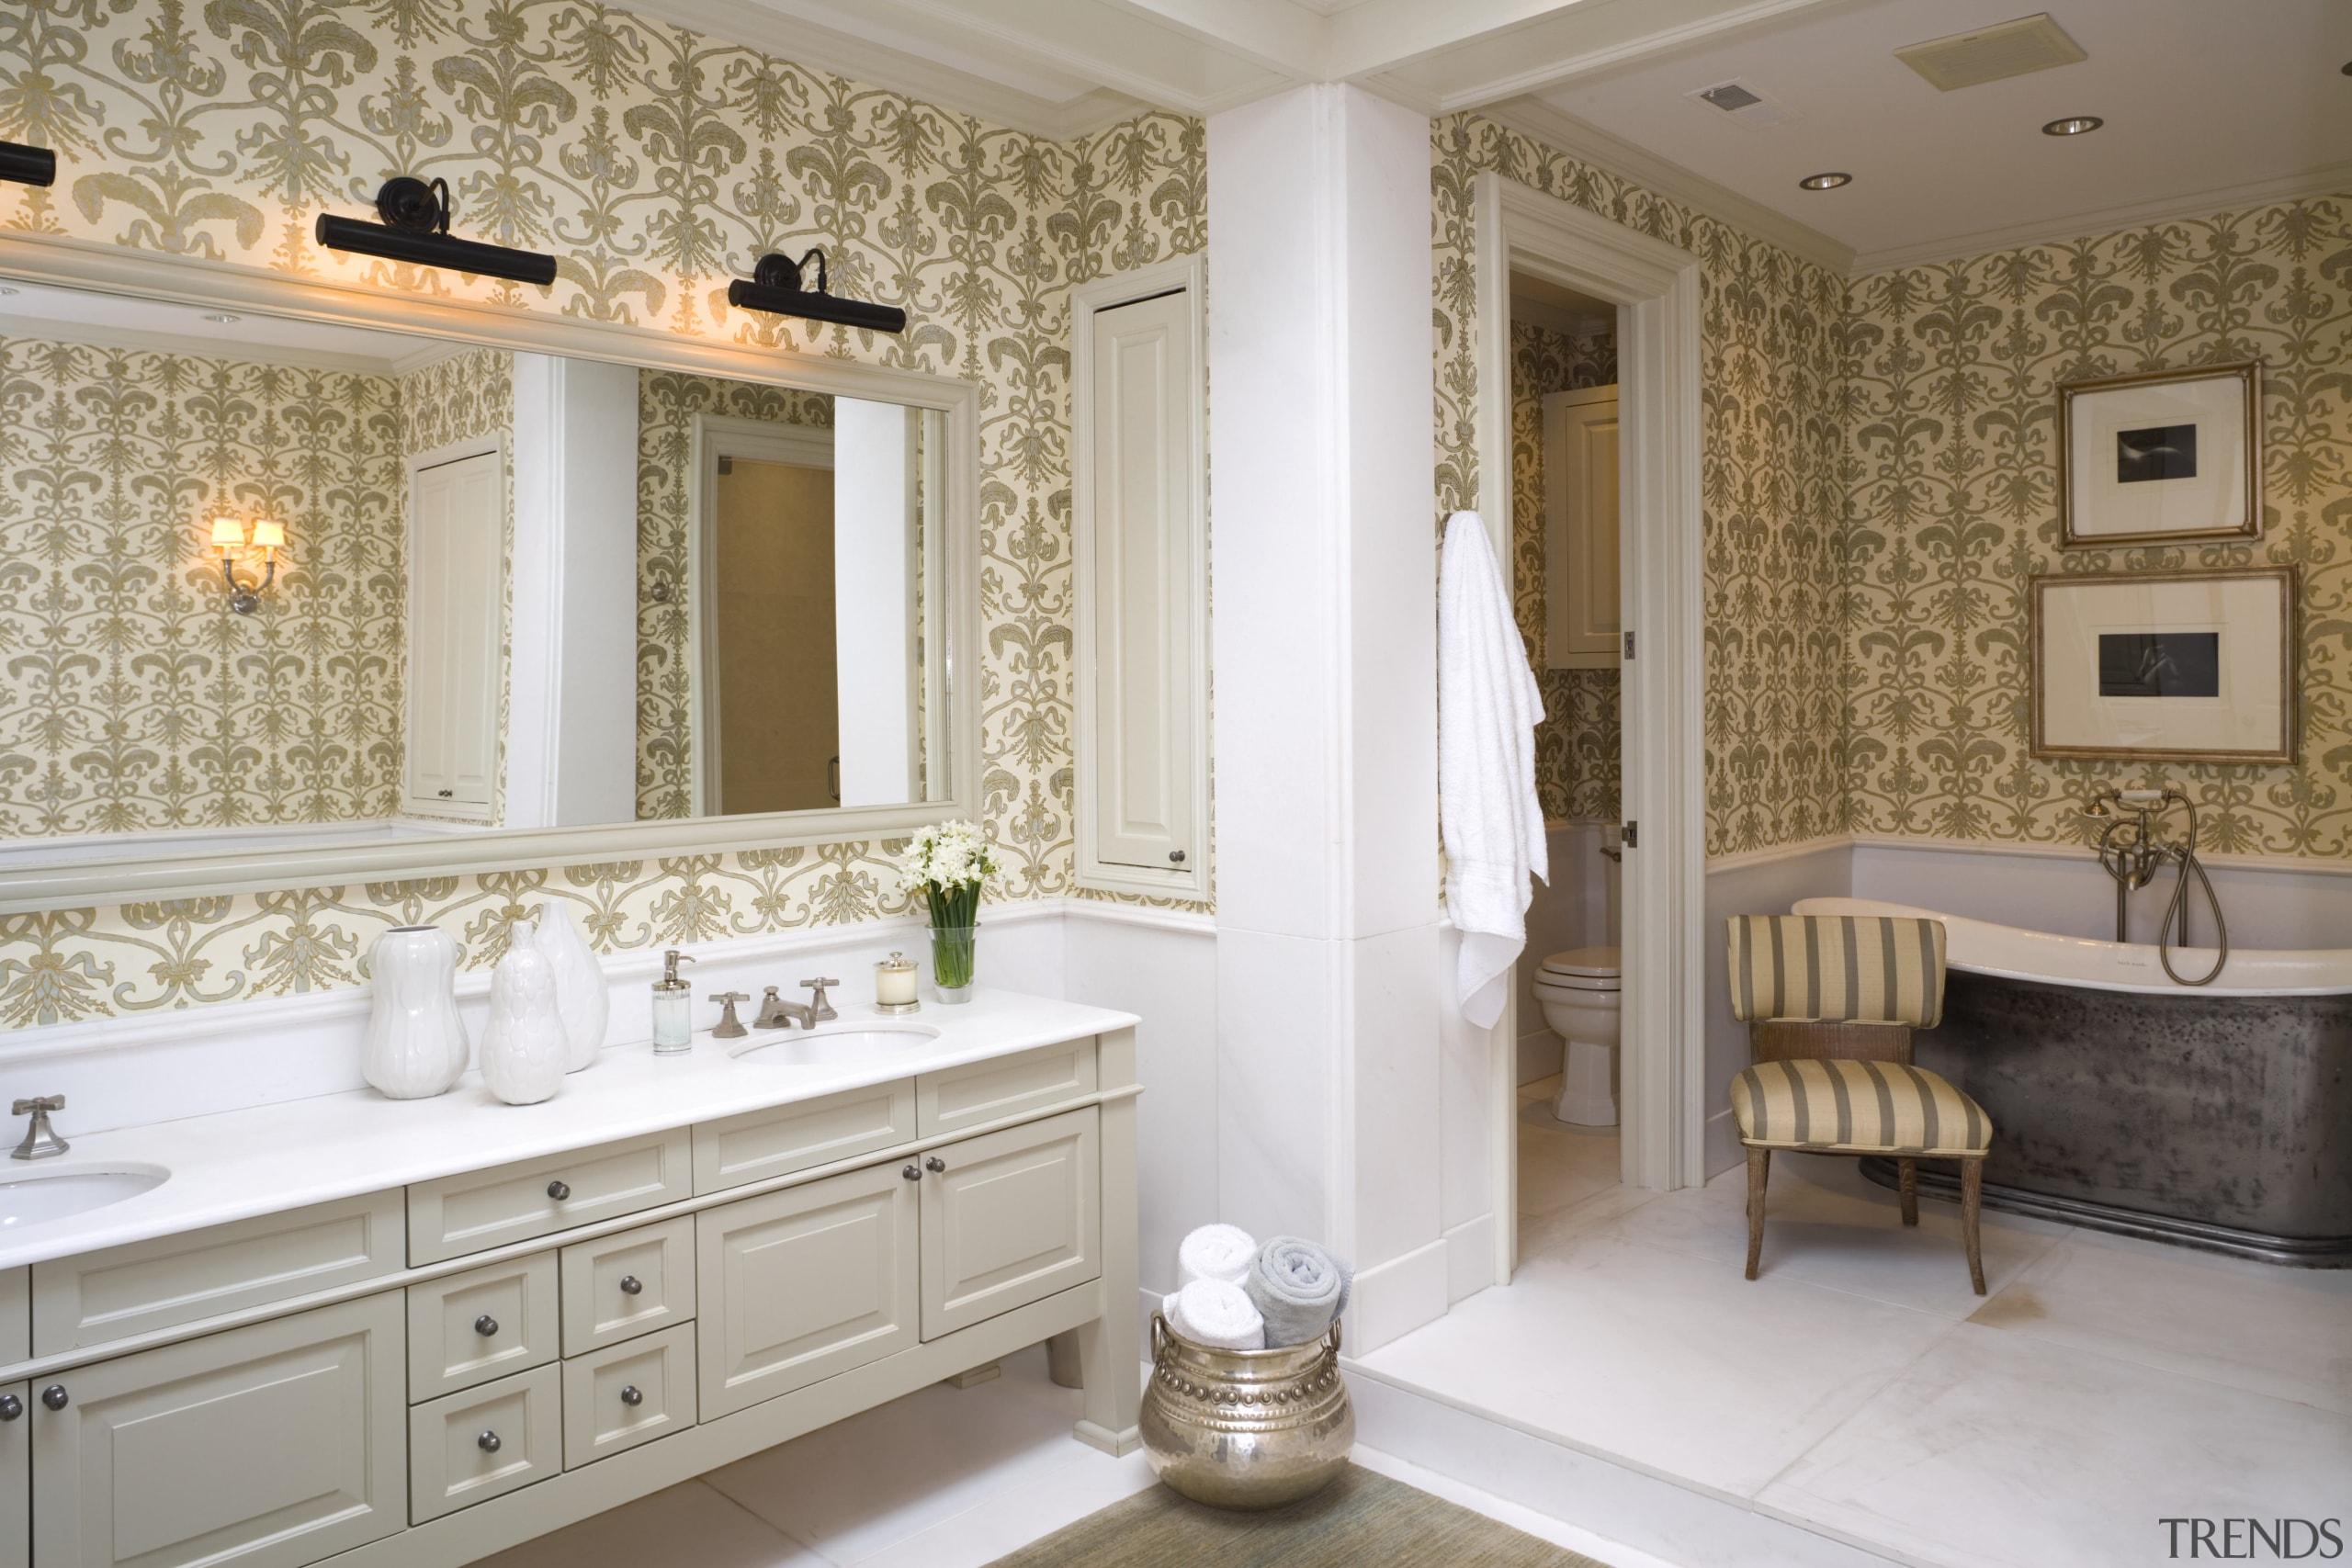 view of bathroom featuring bath tub, bathroom cabinetry, bathroom, bathroom accessory, ceiling, floor, flooring, home, interior design, room, tile, wall, window, gray, brown